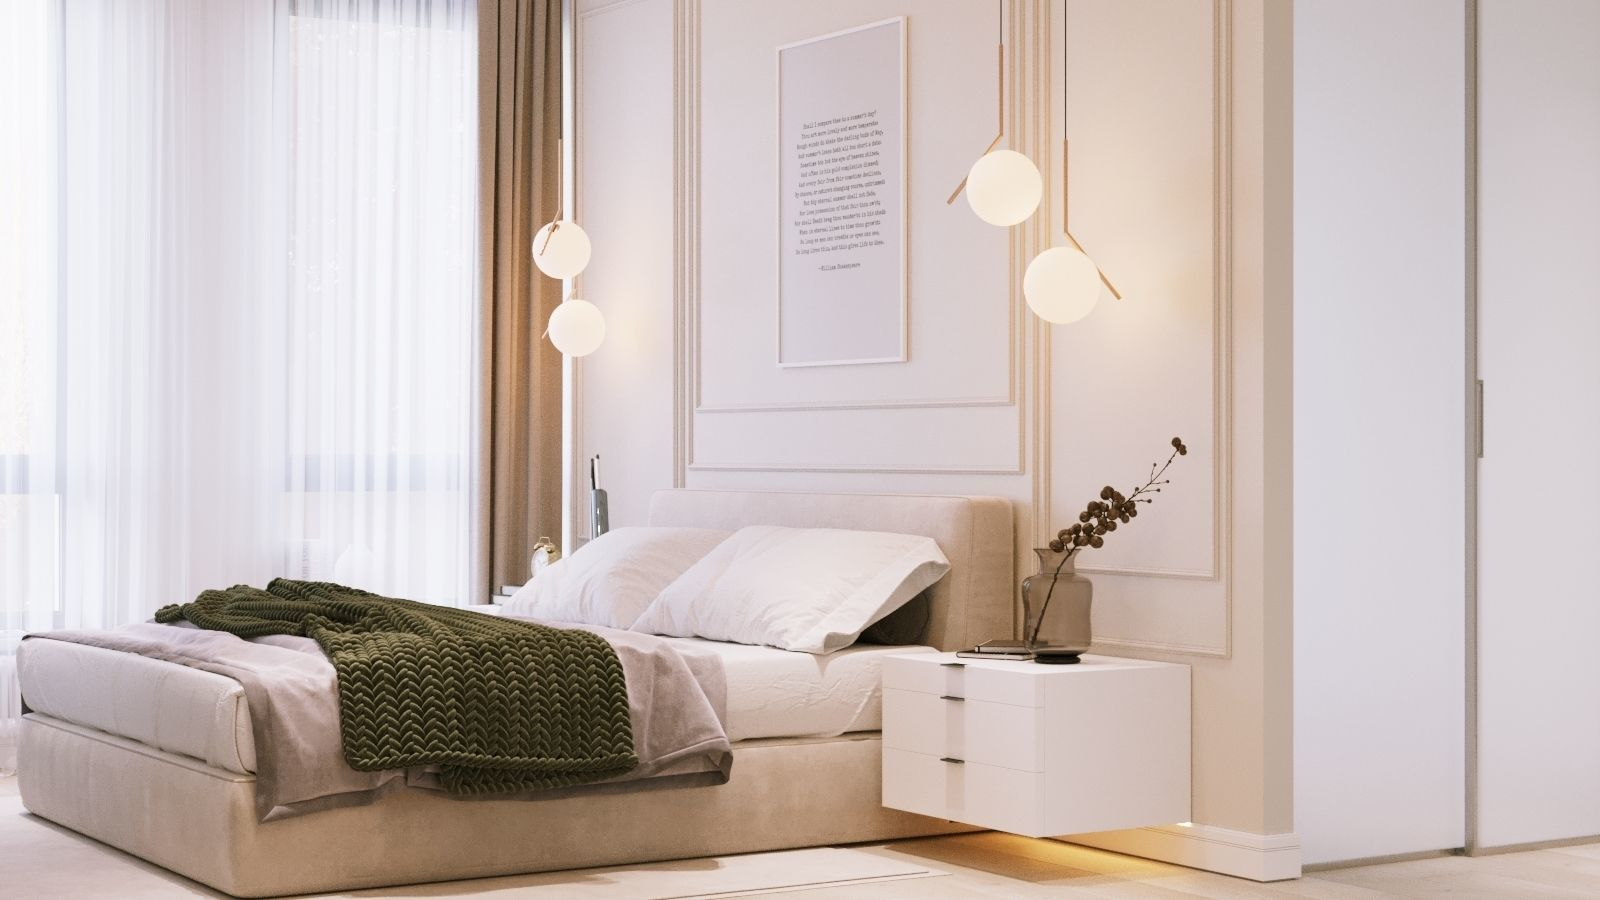 Bedroom Interior Scene and Corona Render